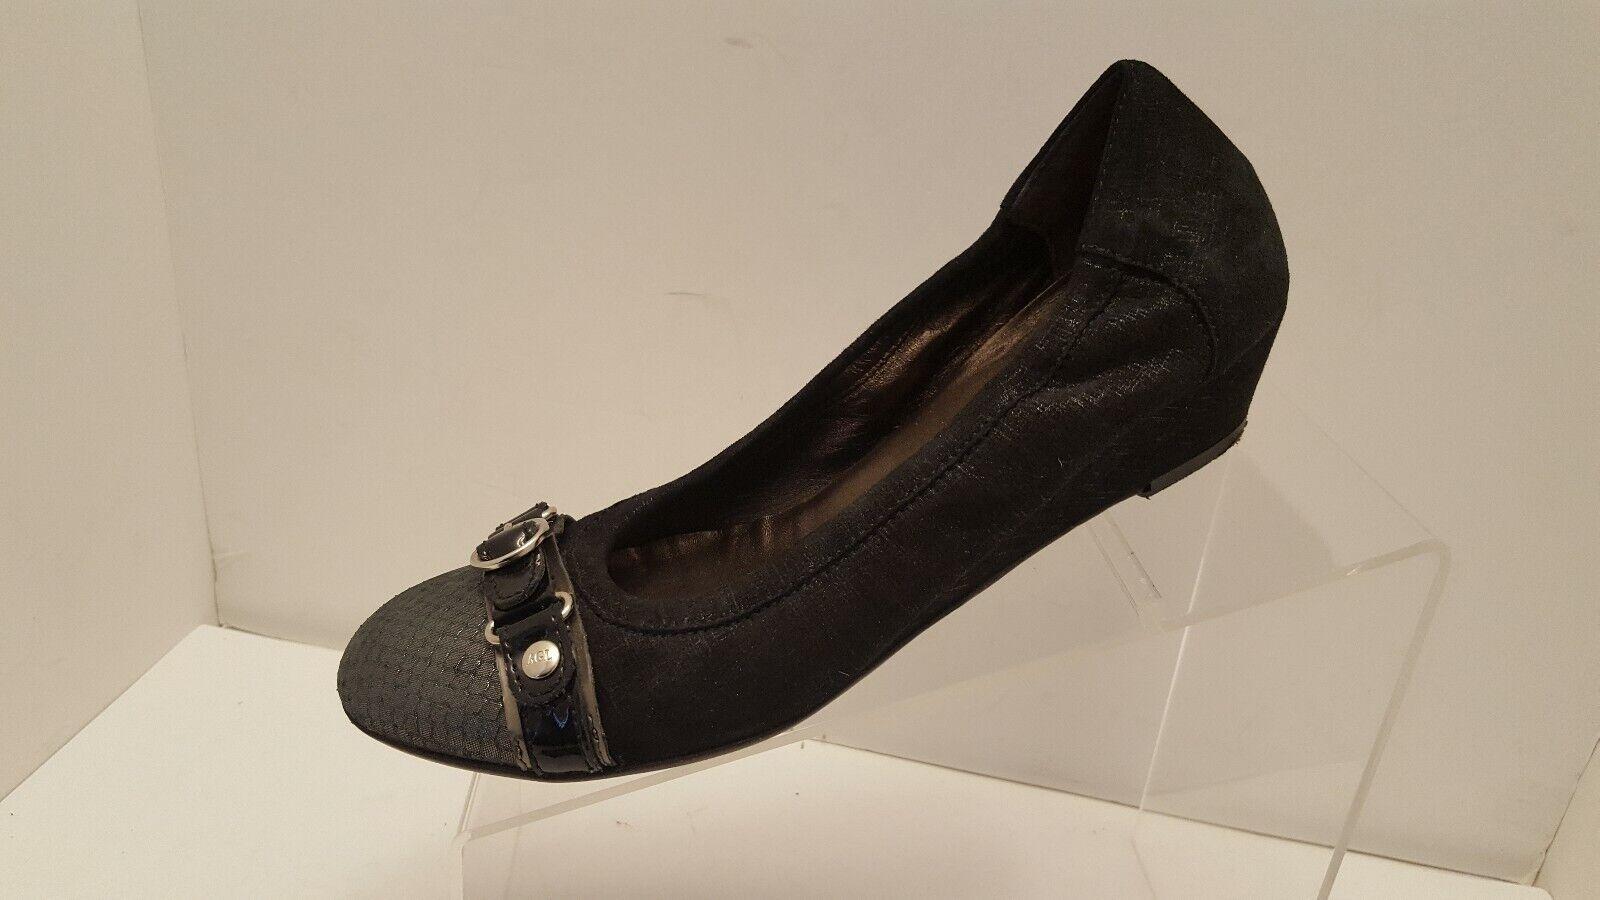 AGL Circle Wedge Pumps Suede Leather Heels Snake Print Black Gray Sz EU 38 US 8